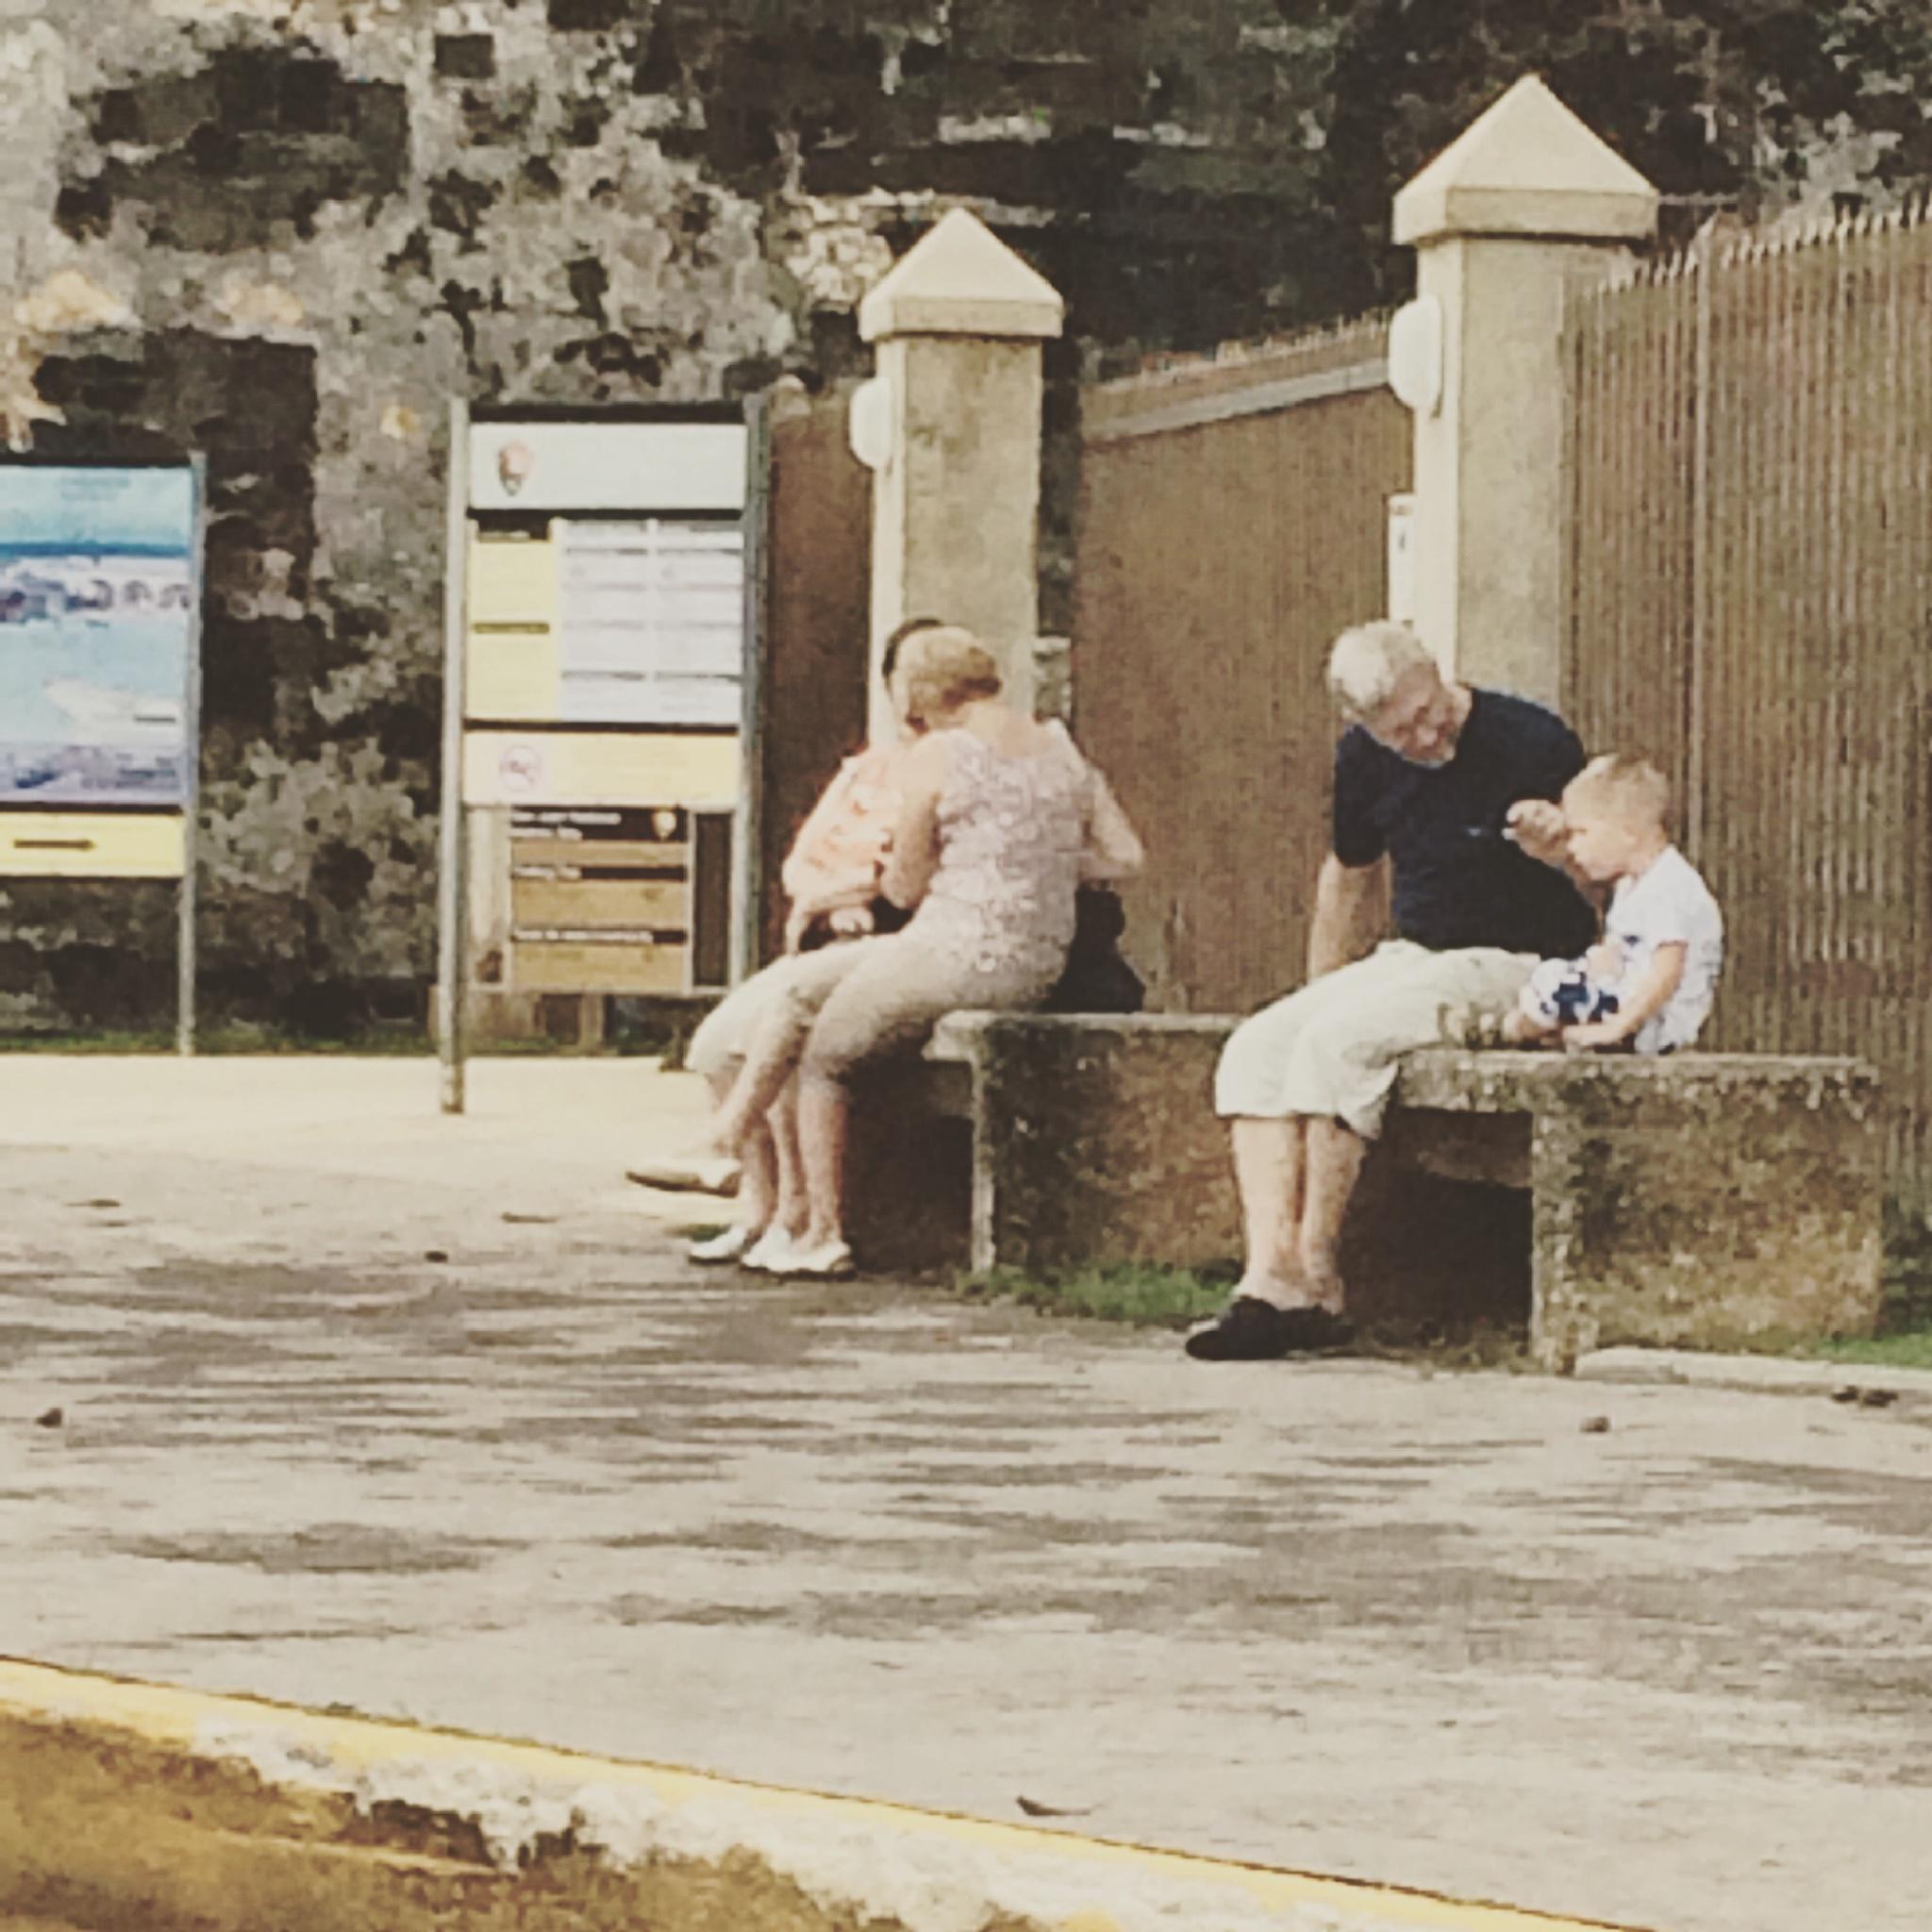 Tourists by Nilda64pr